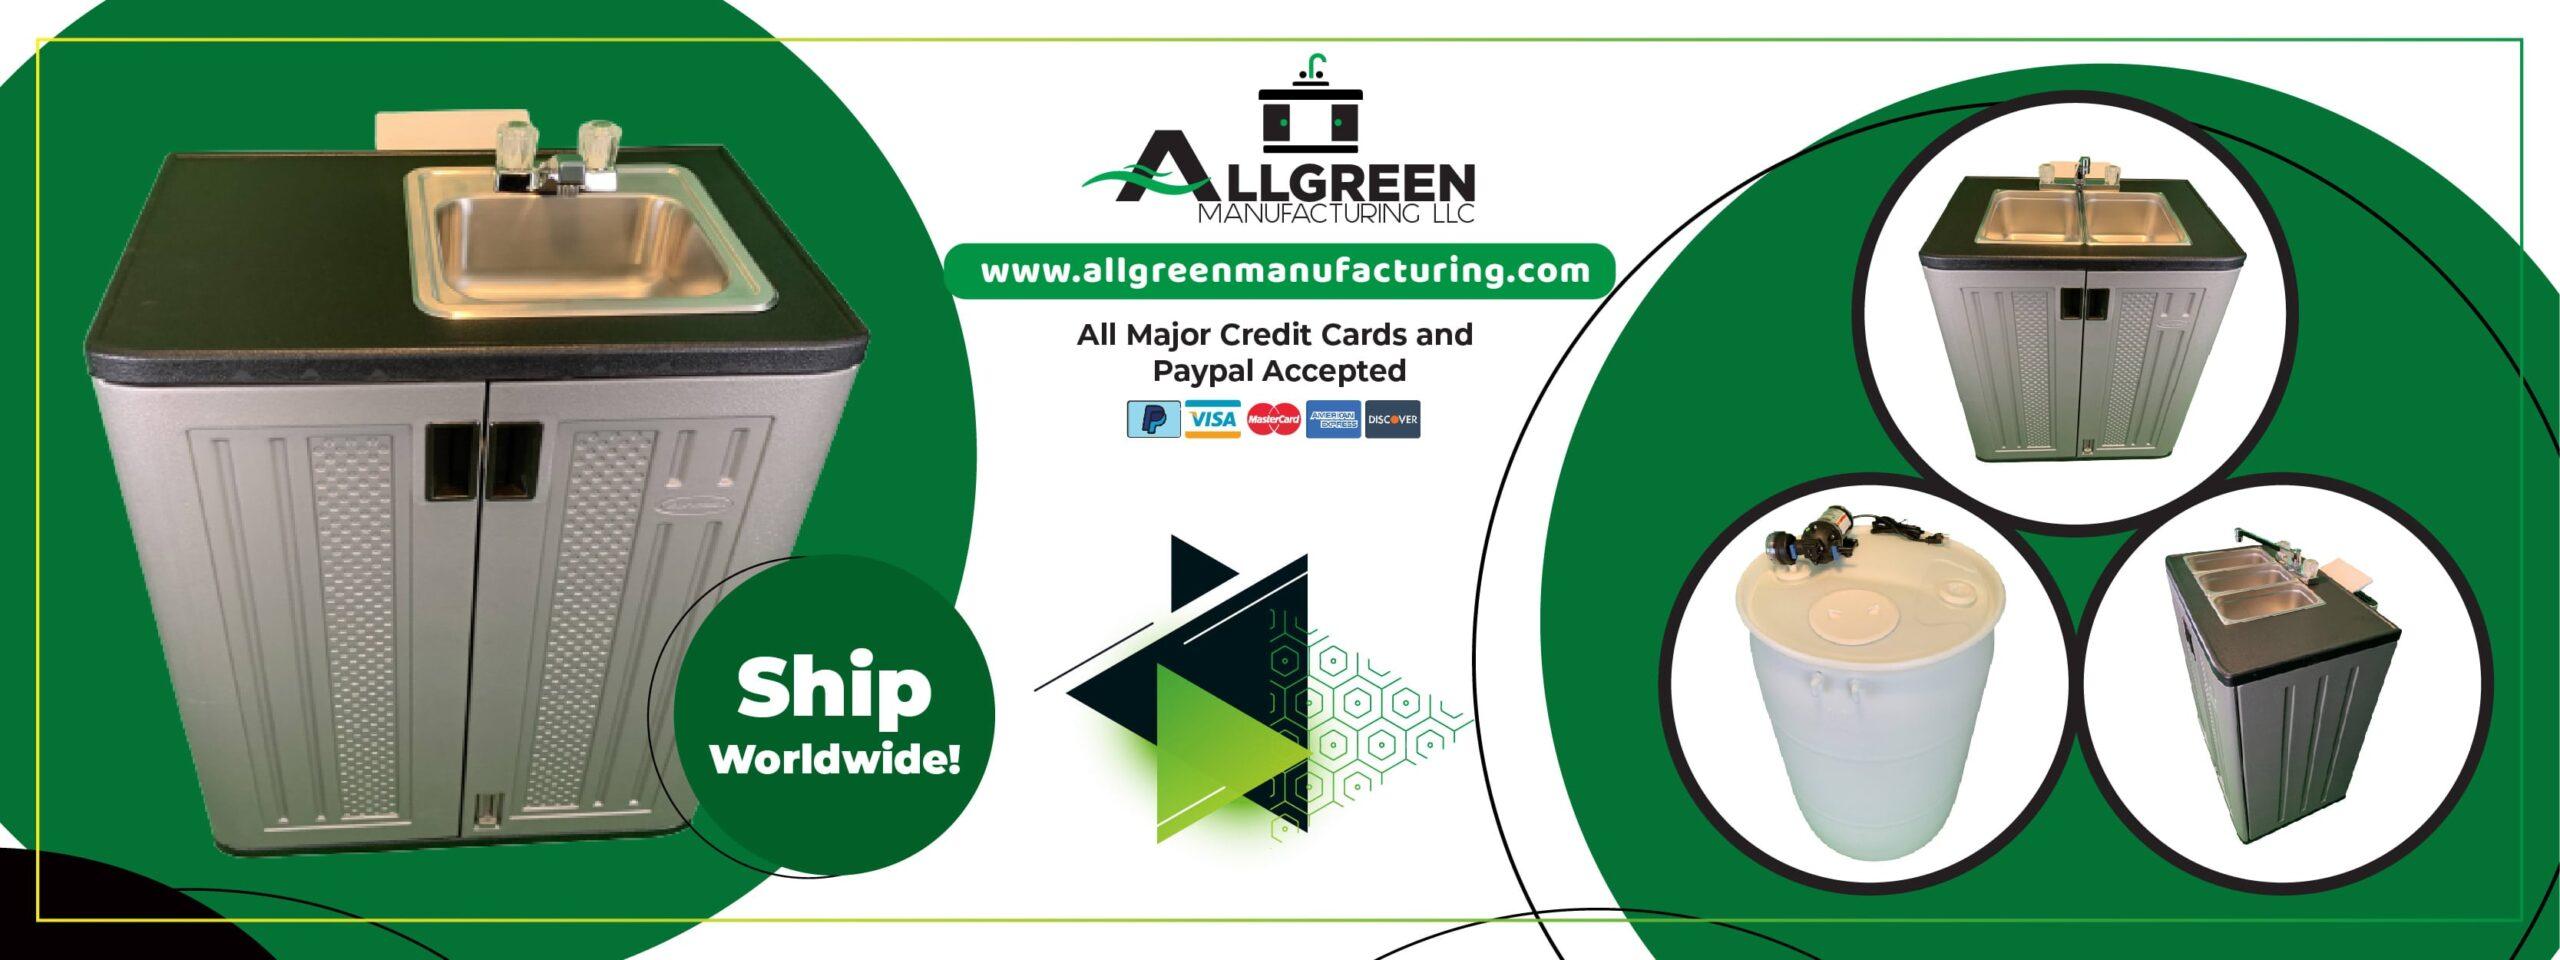 Allgreen Manufacturing